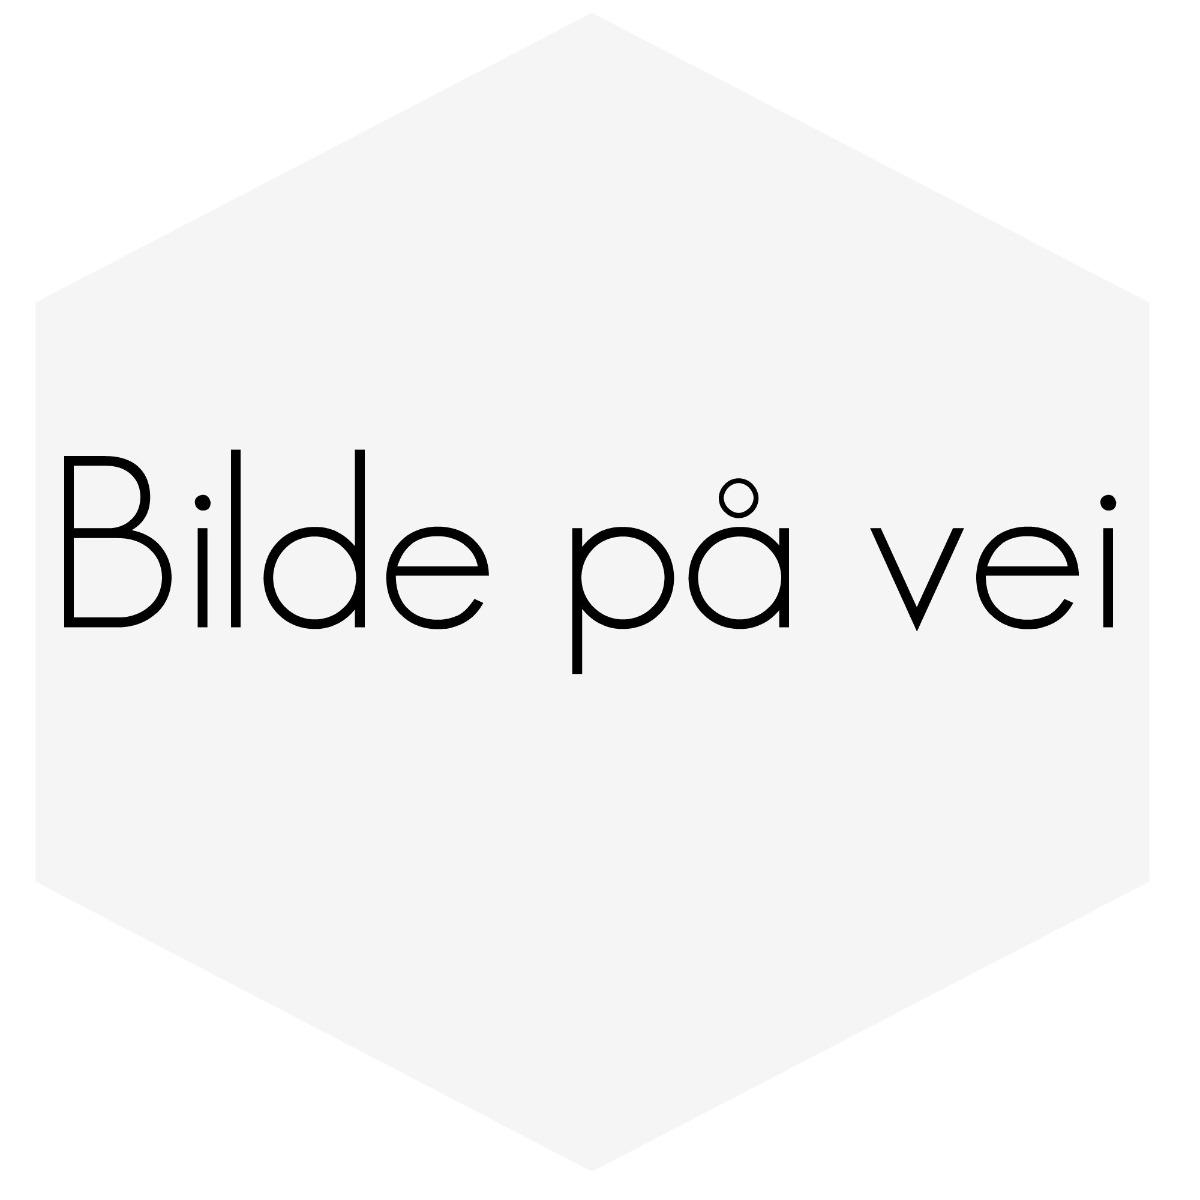 PANHARDSTAG/TVERSTAG JUSTERBART FRA IPD PASSER ALLE 240-260